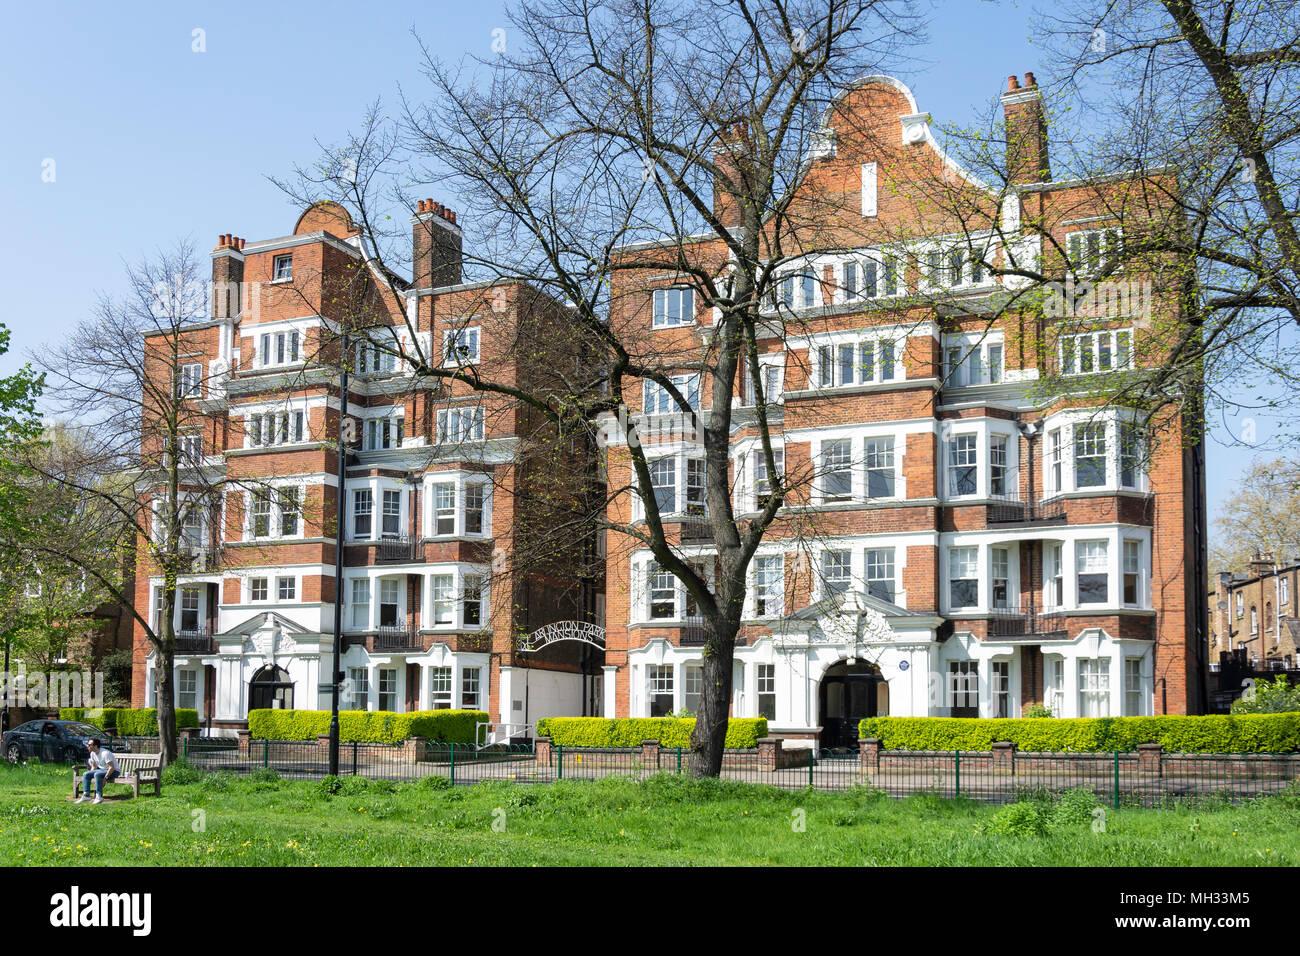 Hounslow central stock photos hounslow central stock - Garden park apartments arlington tx ...